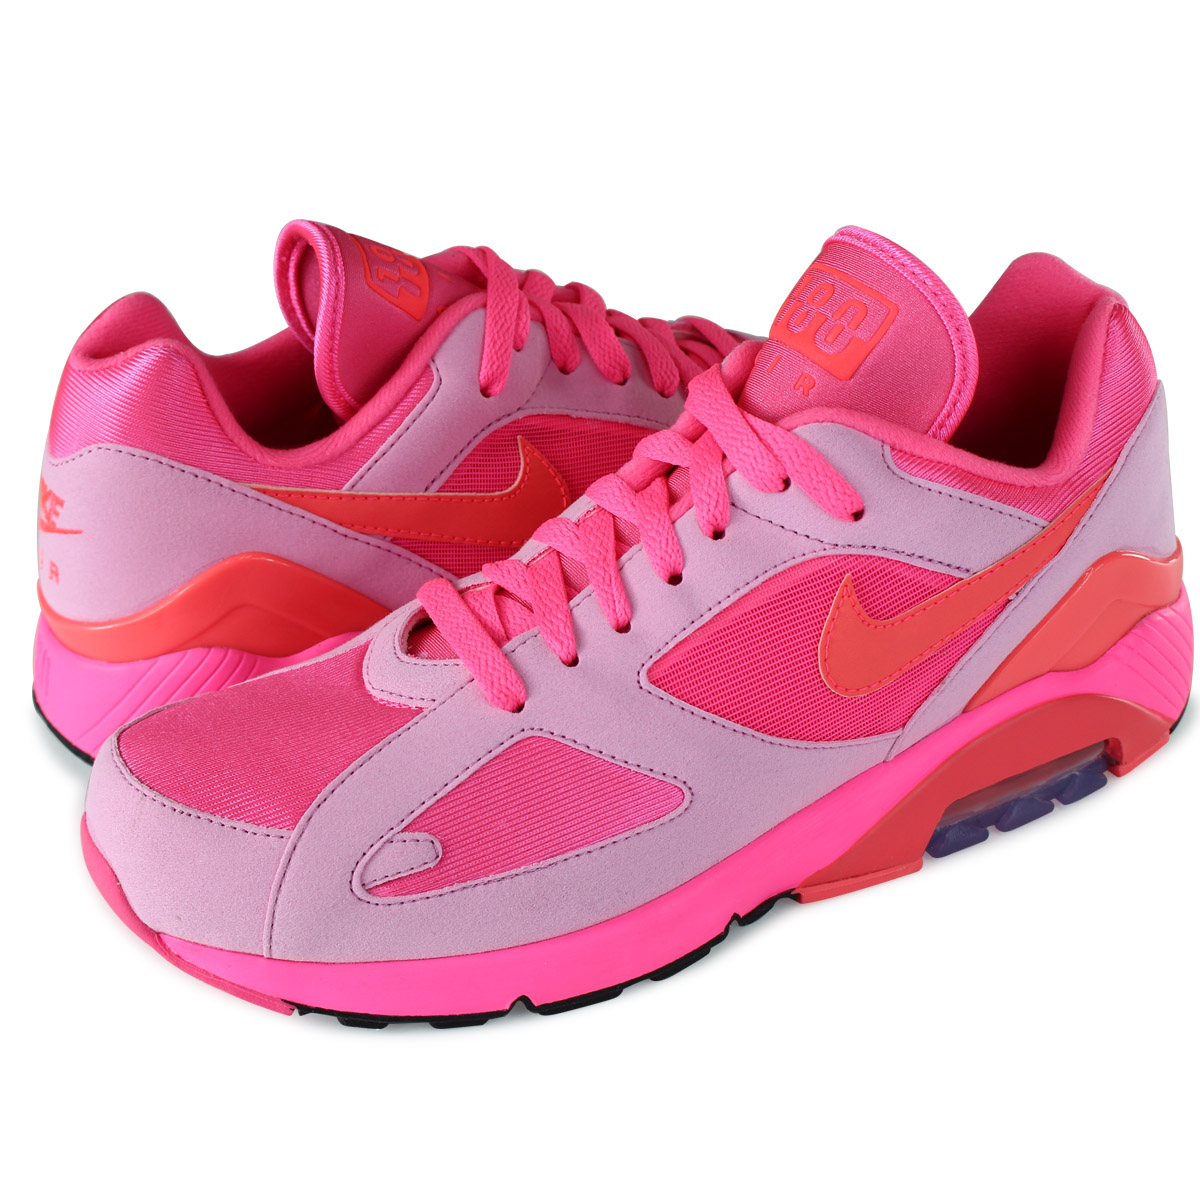 économiser 18ebf 3aaf2 NIKE COMME des GARCONS HOMME PLUS AIR MAX 180 CDG ナイキコムデギャルソンエアマックス 180  sneakers men AO4641-602 pink